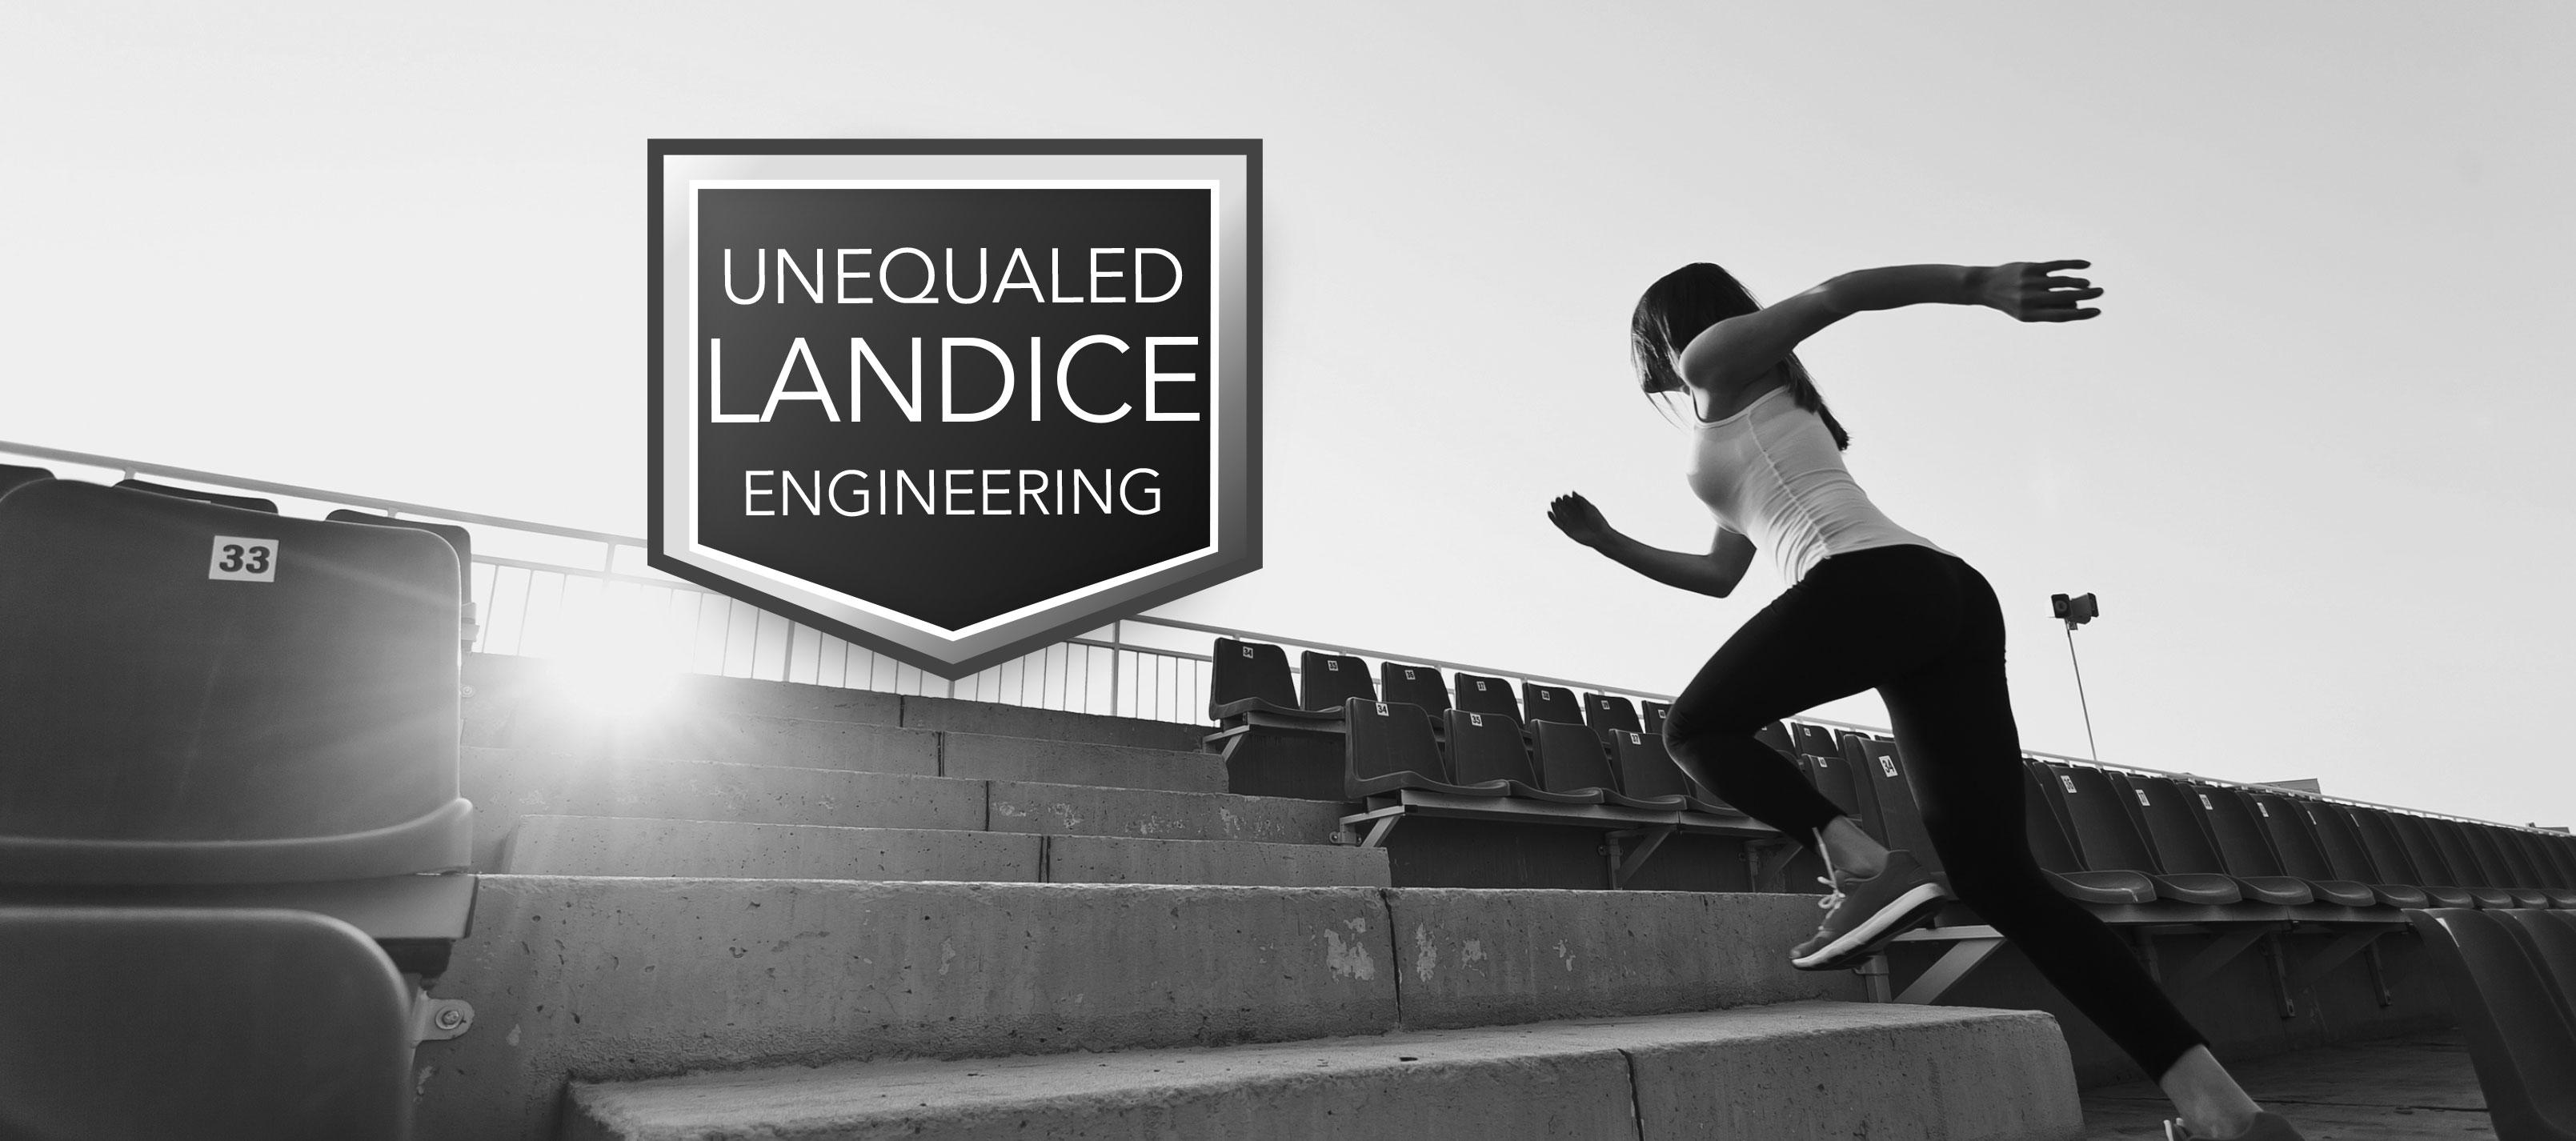 Landice-Parts-Page-Image-1.jpg